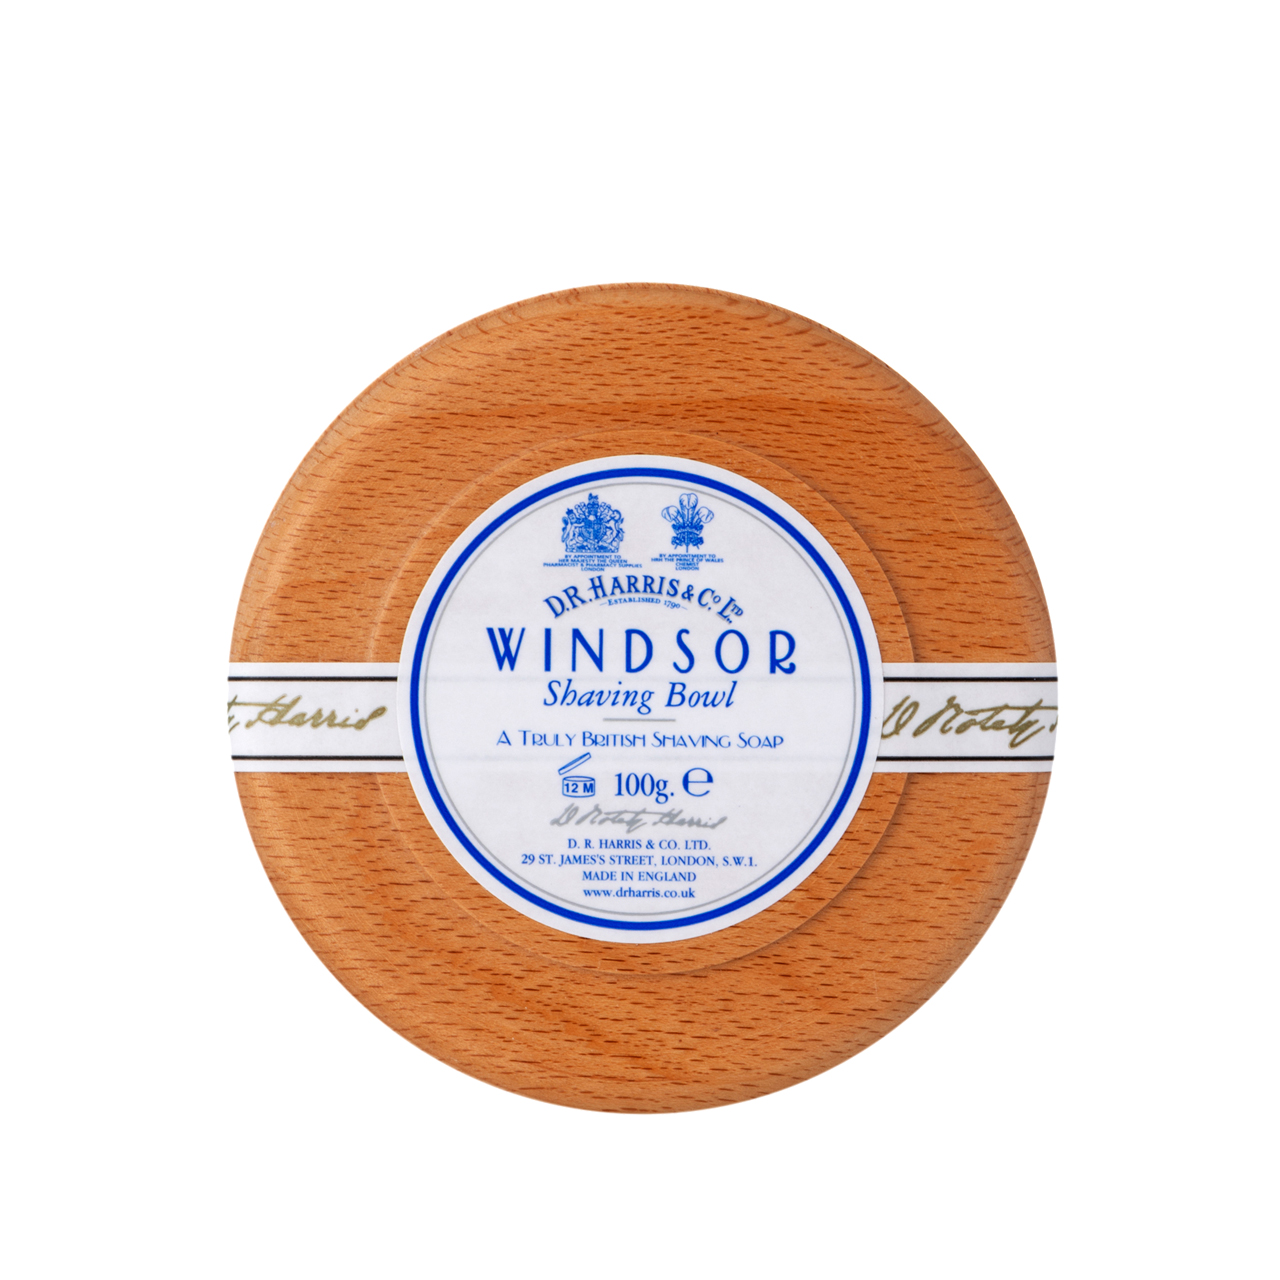 Windsor - Shaving Soap Bowl